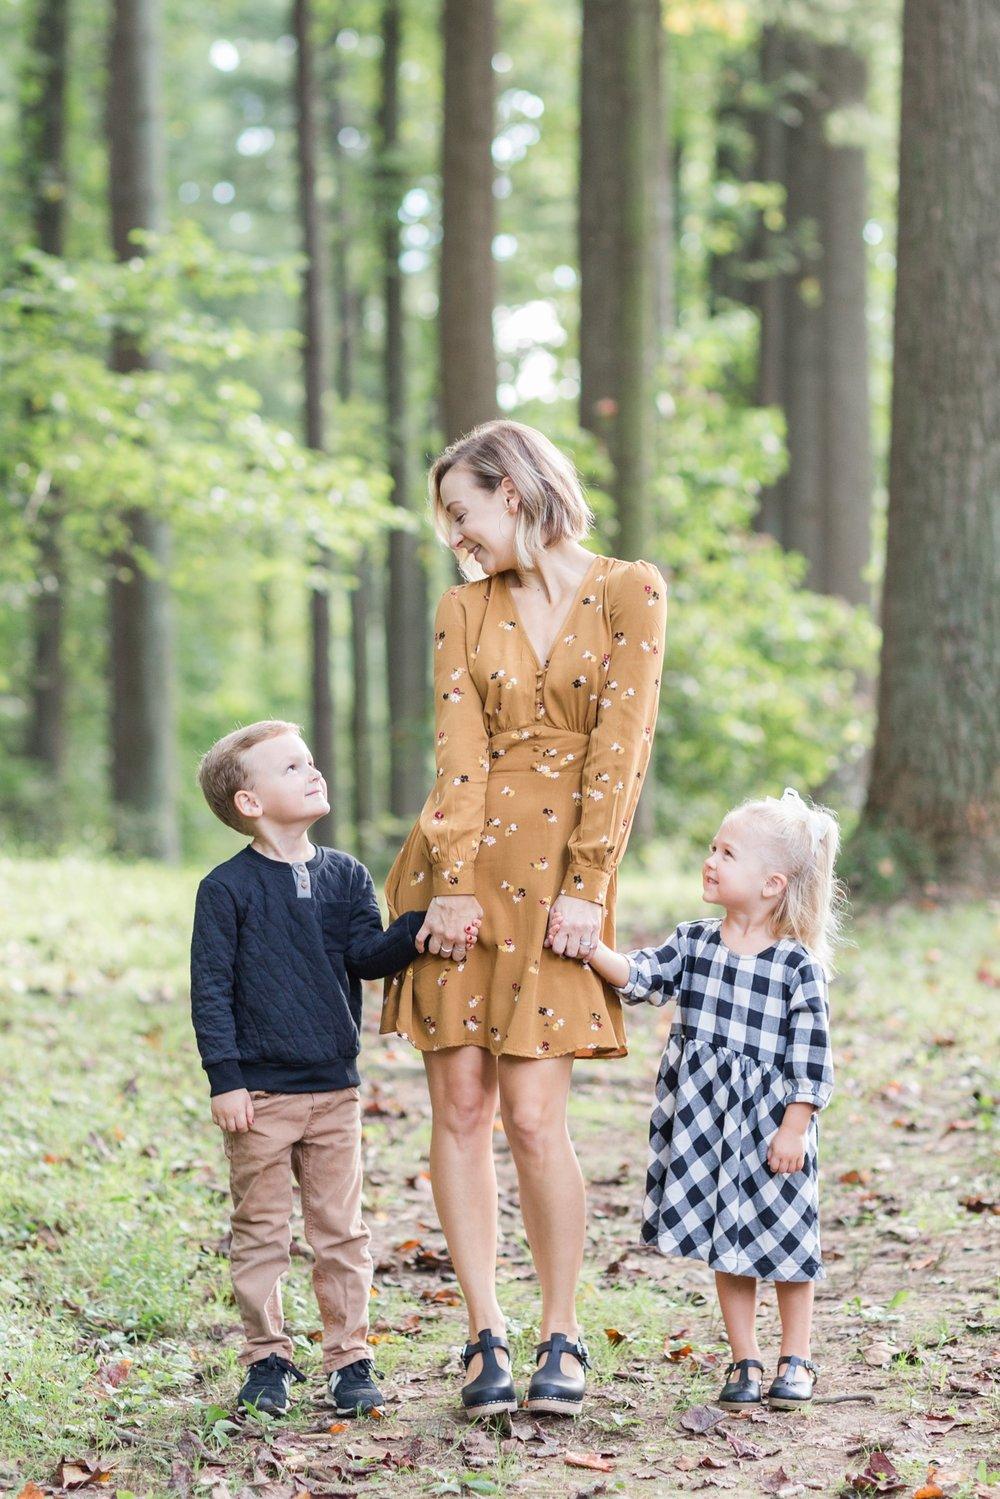 Robinson Siemen Family 2018-14_Loch-Raven-Reservoir-Maryland-Family-Photographer-anna-grace-photography-photo.jpg